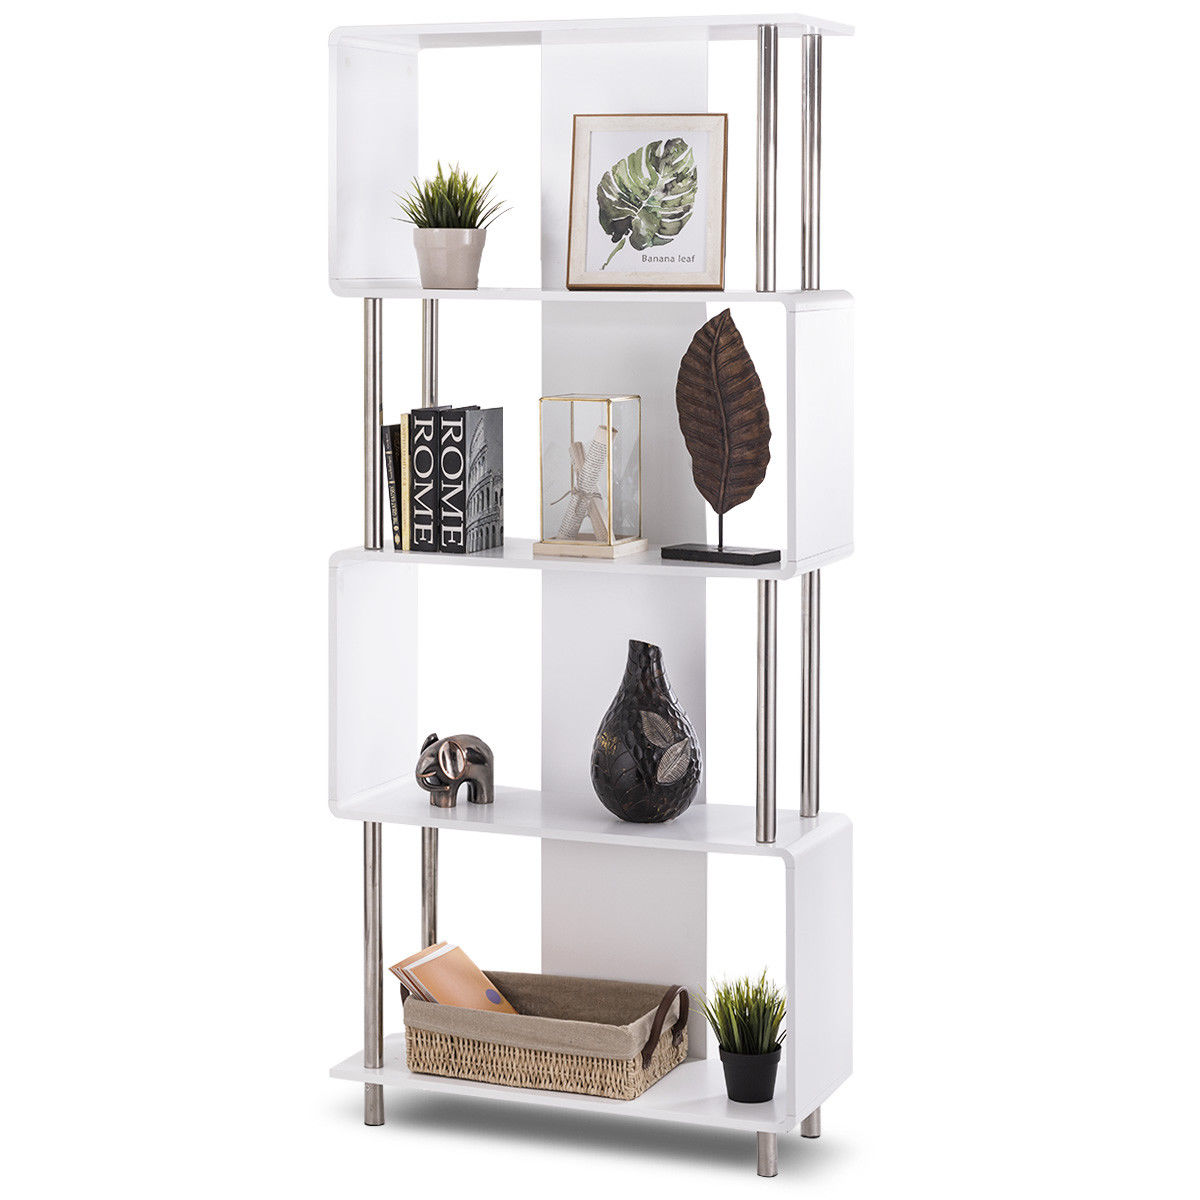 Giantex Industrial Style 4 Shelf Modern Bookcase Living Room Storage Display Unit Bookshelf White Home Furniture HW56698